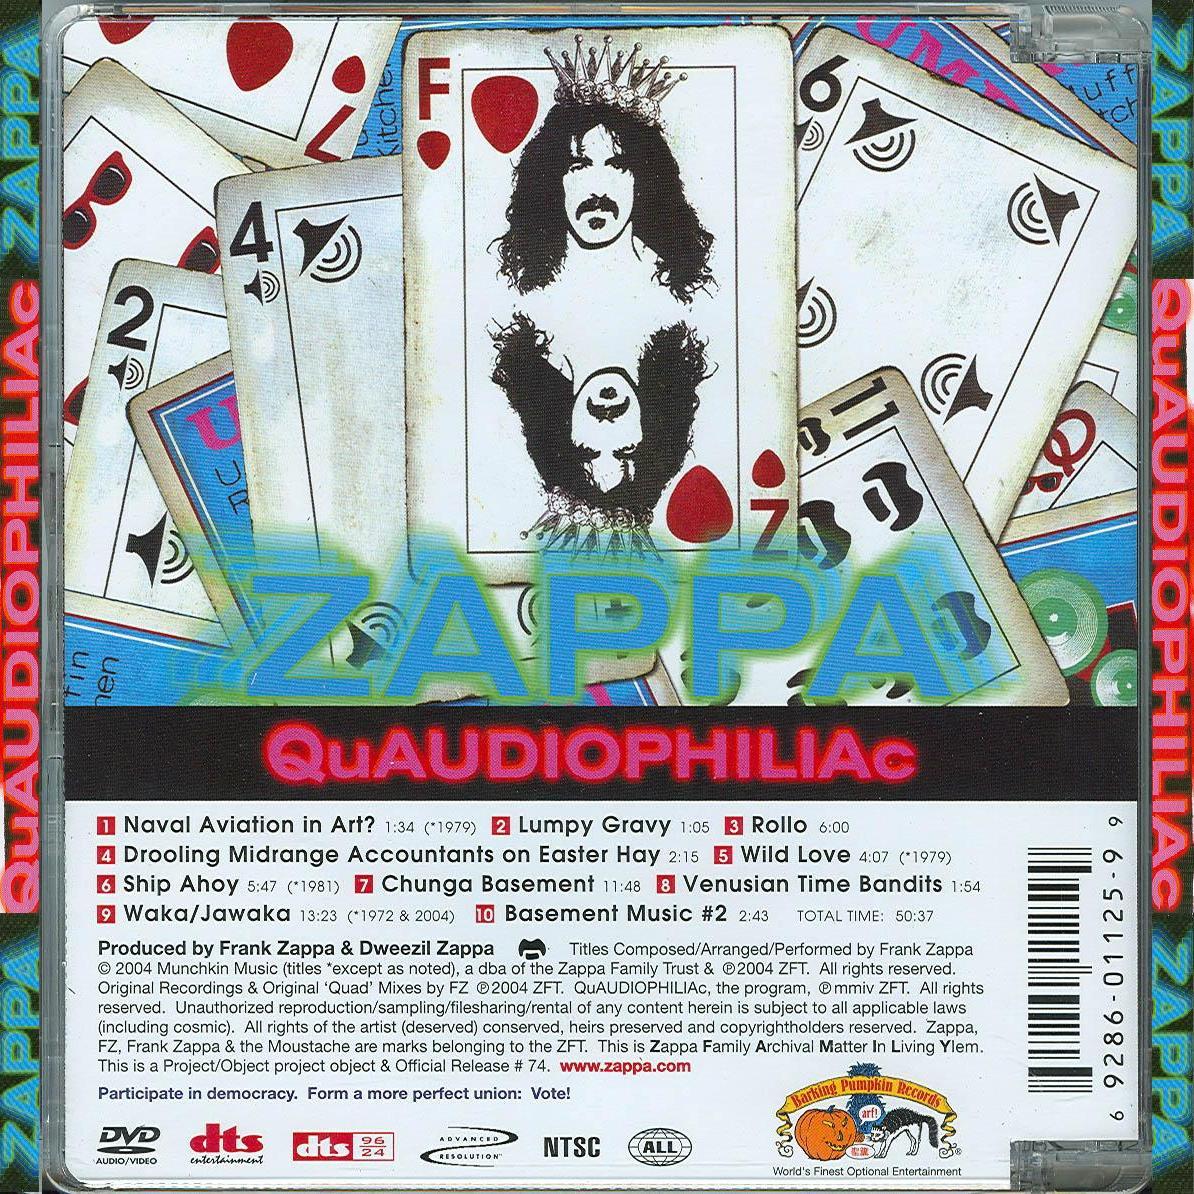 Frank Zappa - QuAUDIOPHILIAc - Back.jpg